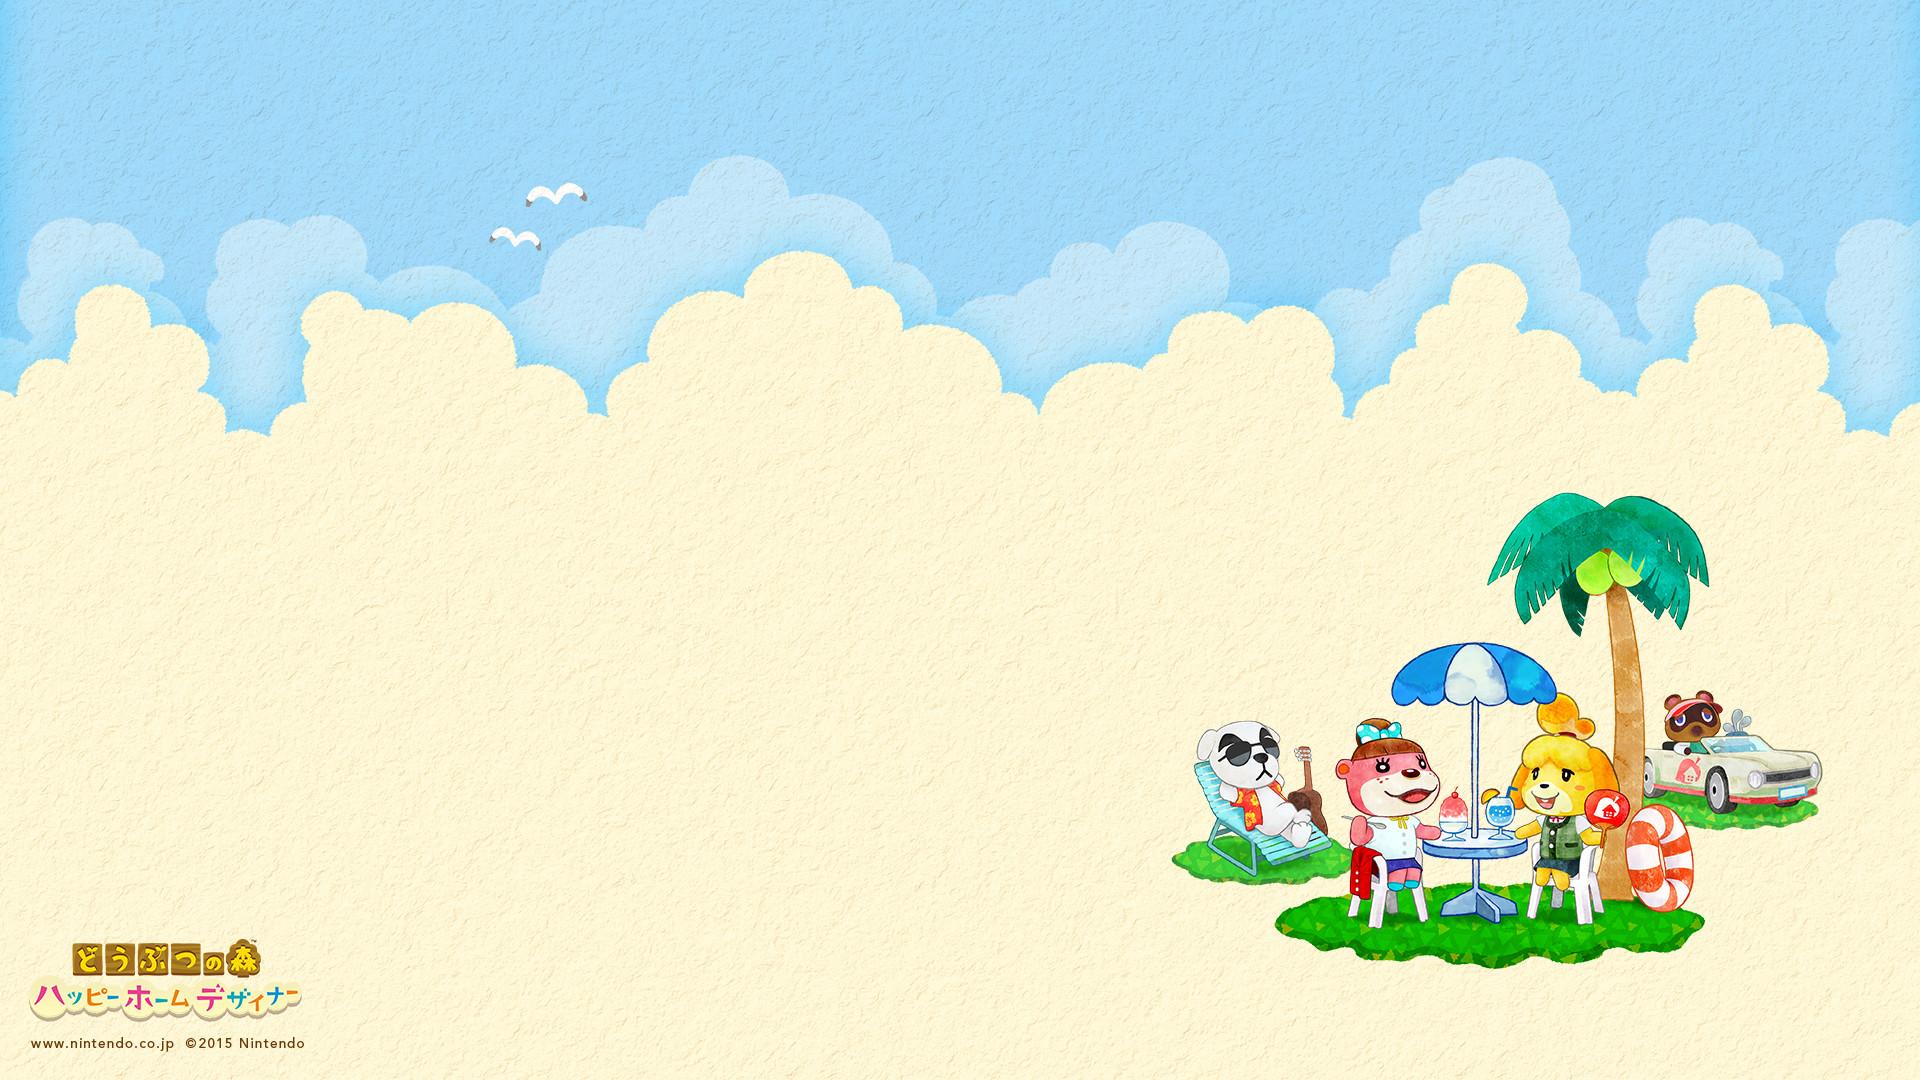 Happy Home Designer Summer Desktop Wallpaper - Animal Crossing Desktop Background - HD Wallpaper